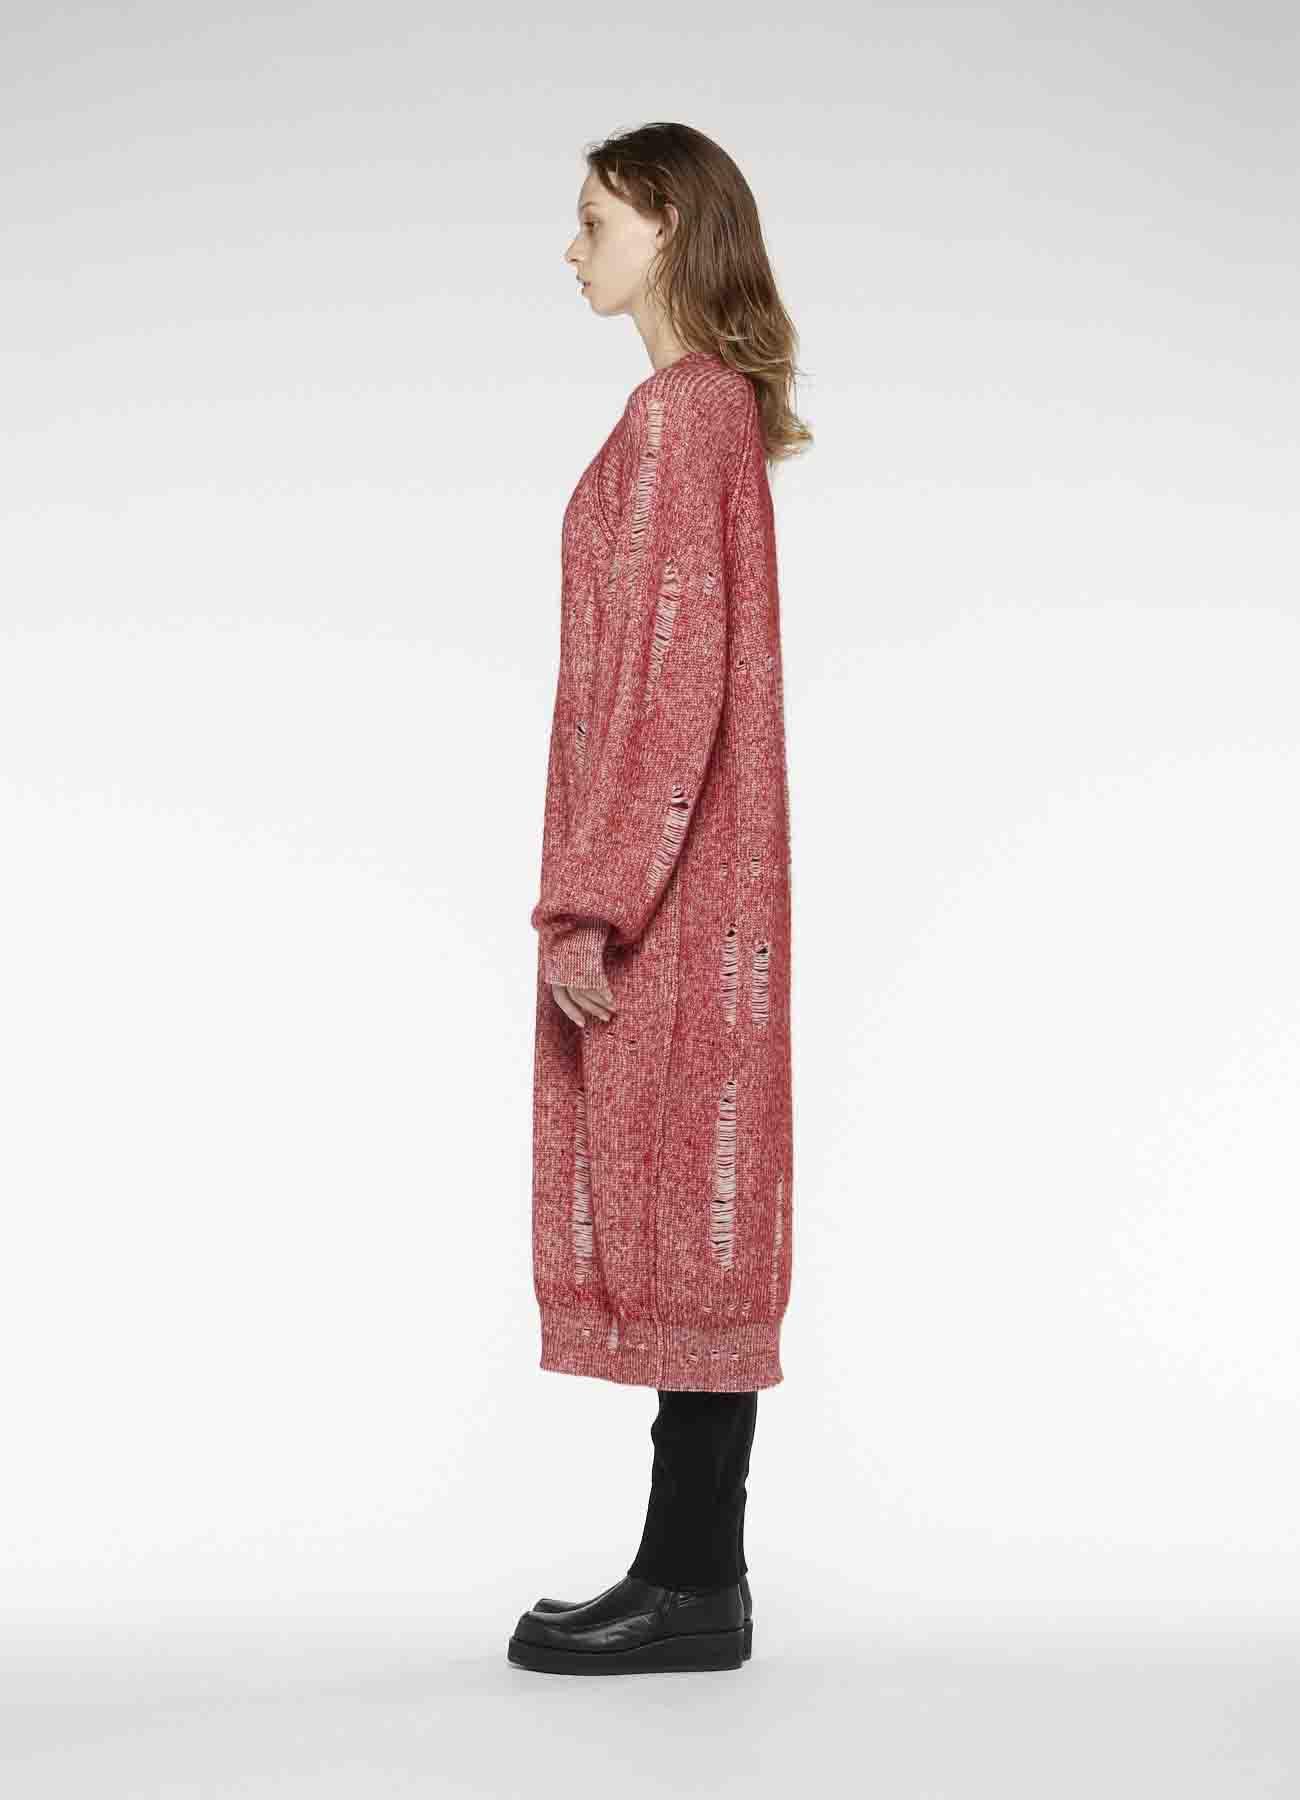 RISMATbyY's WOOL MOHAIR HOLE DRESS